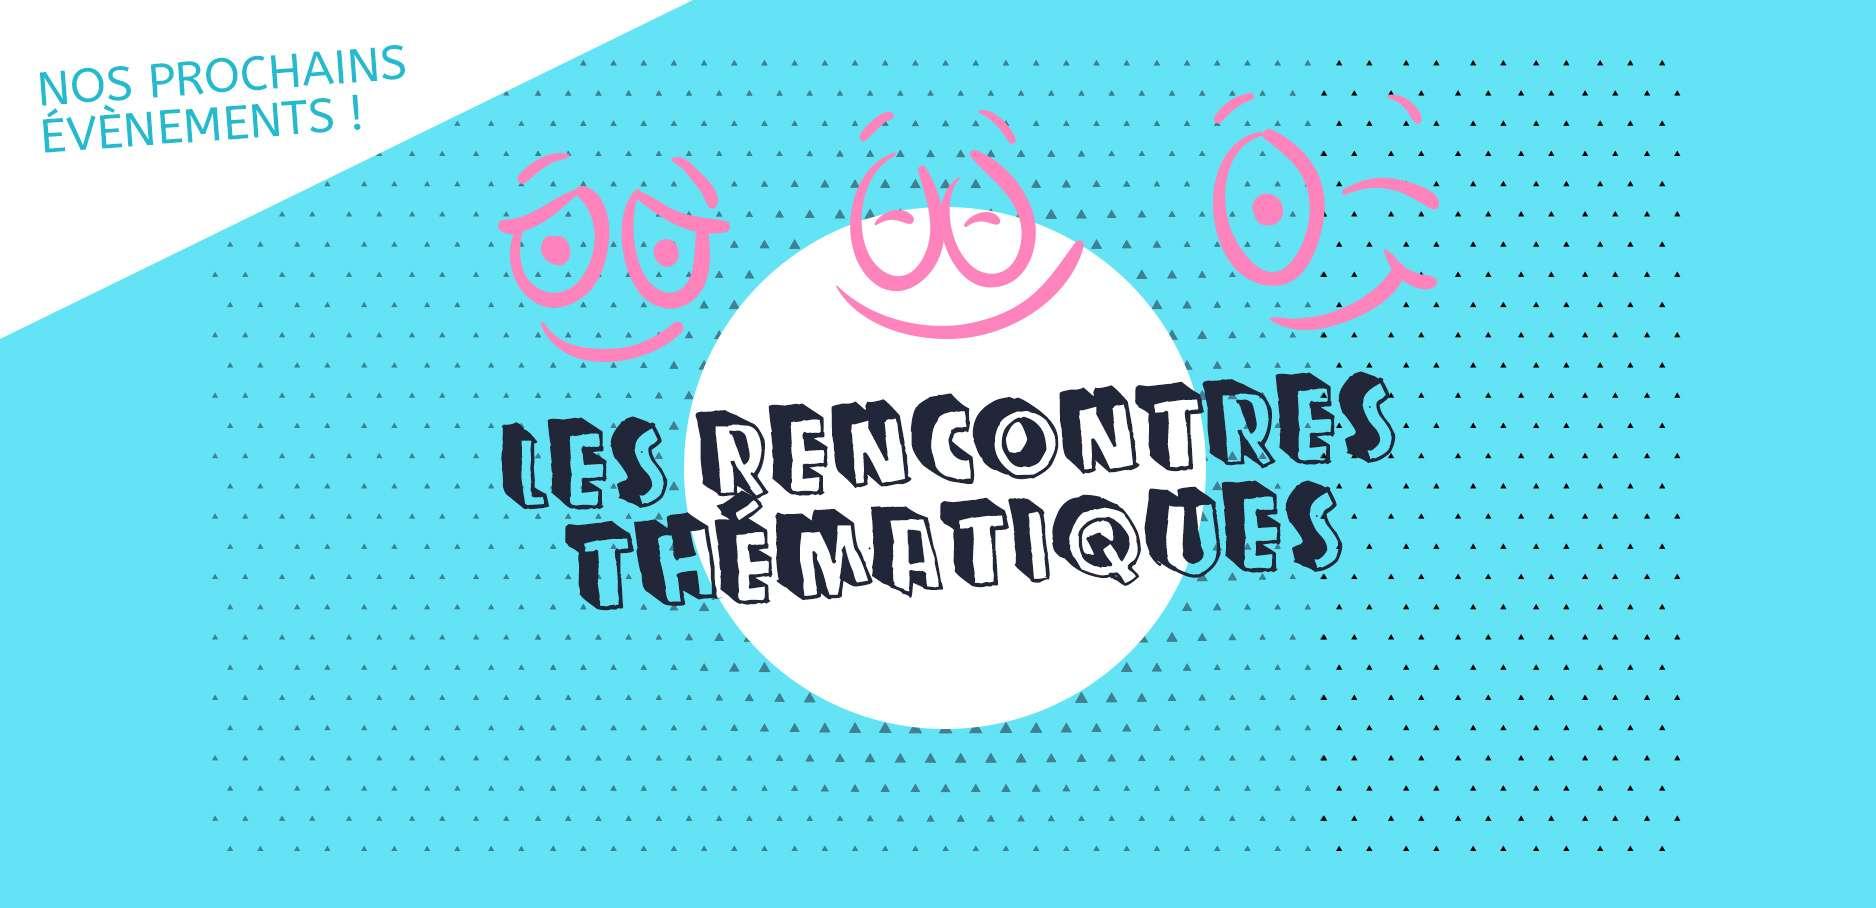 CJP_event-rencontres-thematiques